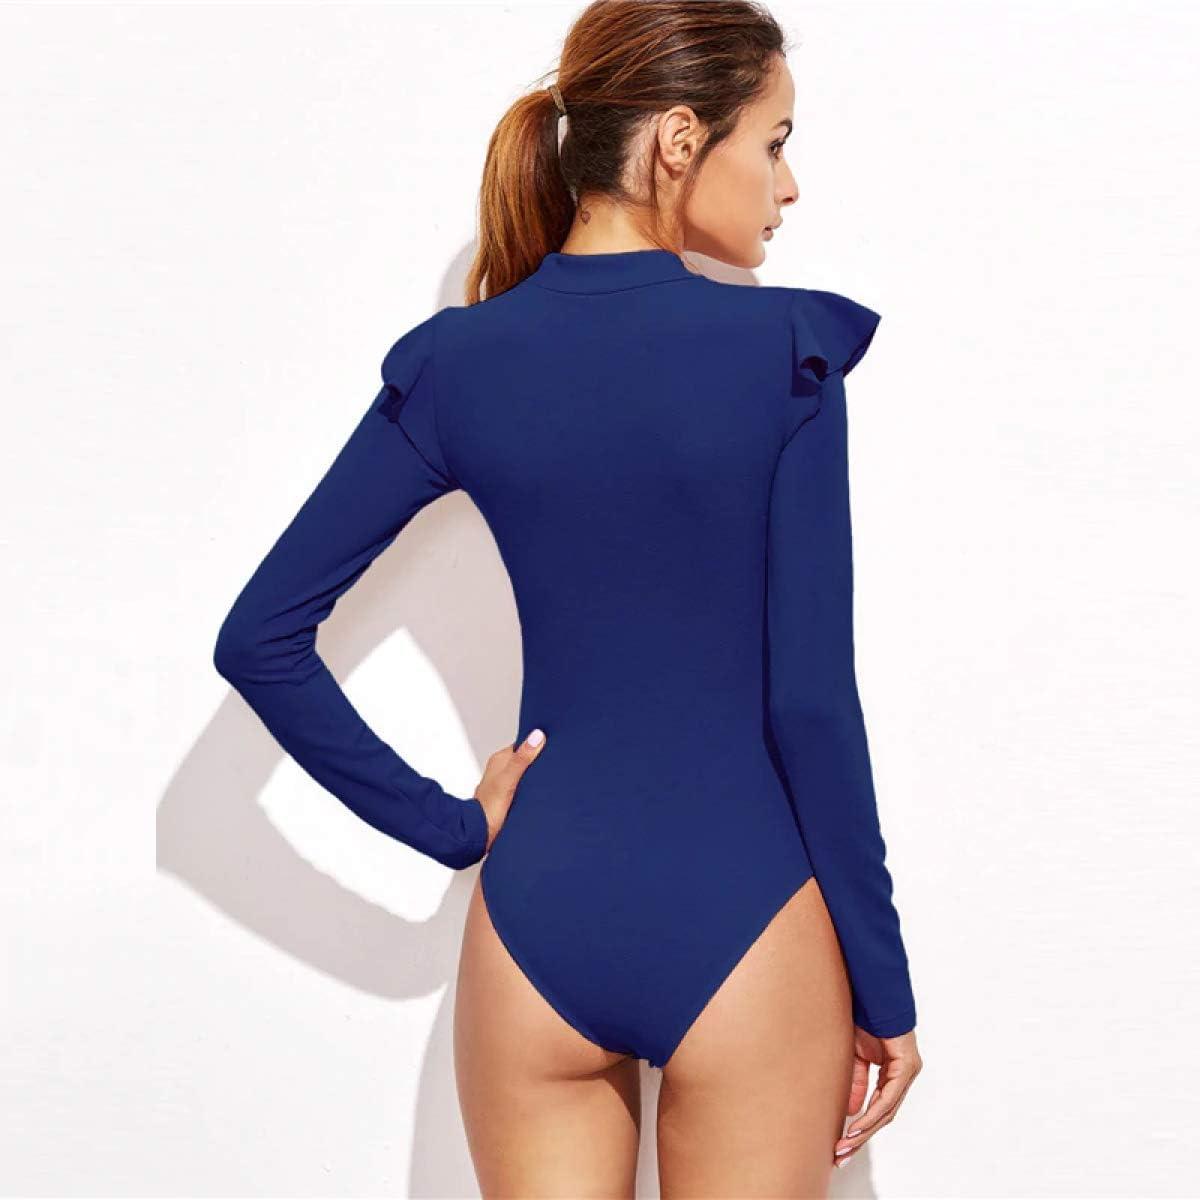 MIKI SHOP Blue Mock Neck Frill Textured Bodysuit Women Clothes Long Sleeve